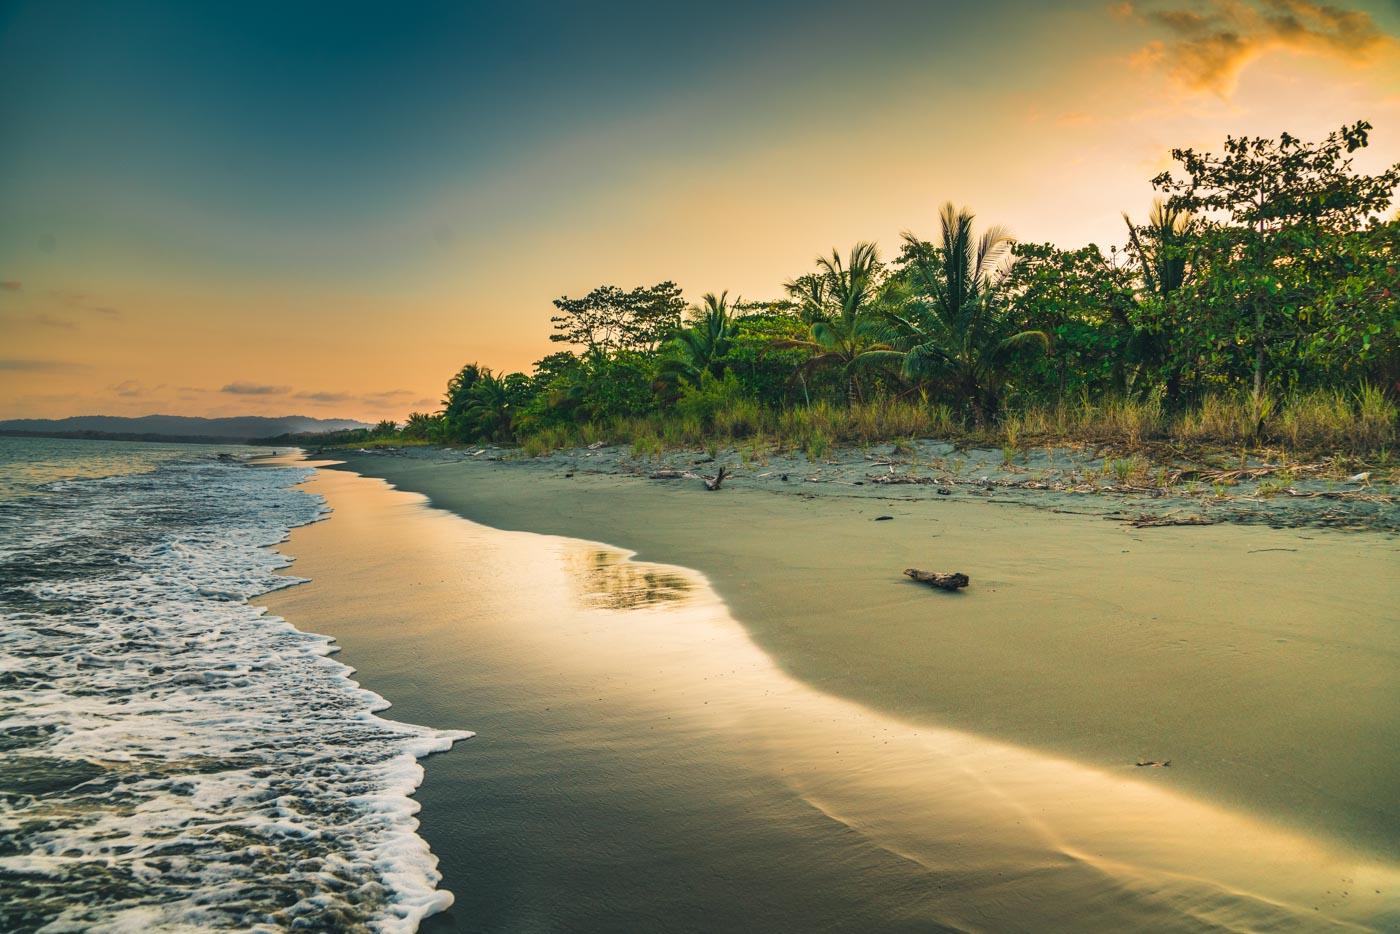 Puerto Jimenez Costa Rica: Playa at sunset, Puerto Jimenez. Osa Peninsula